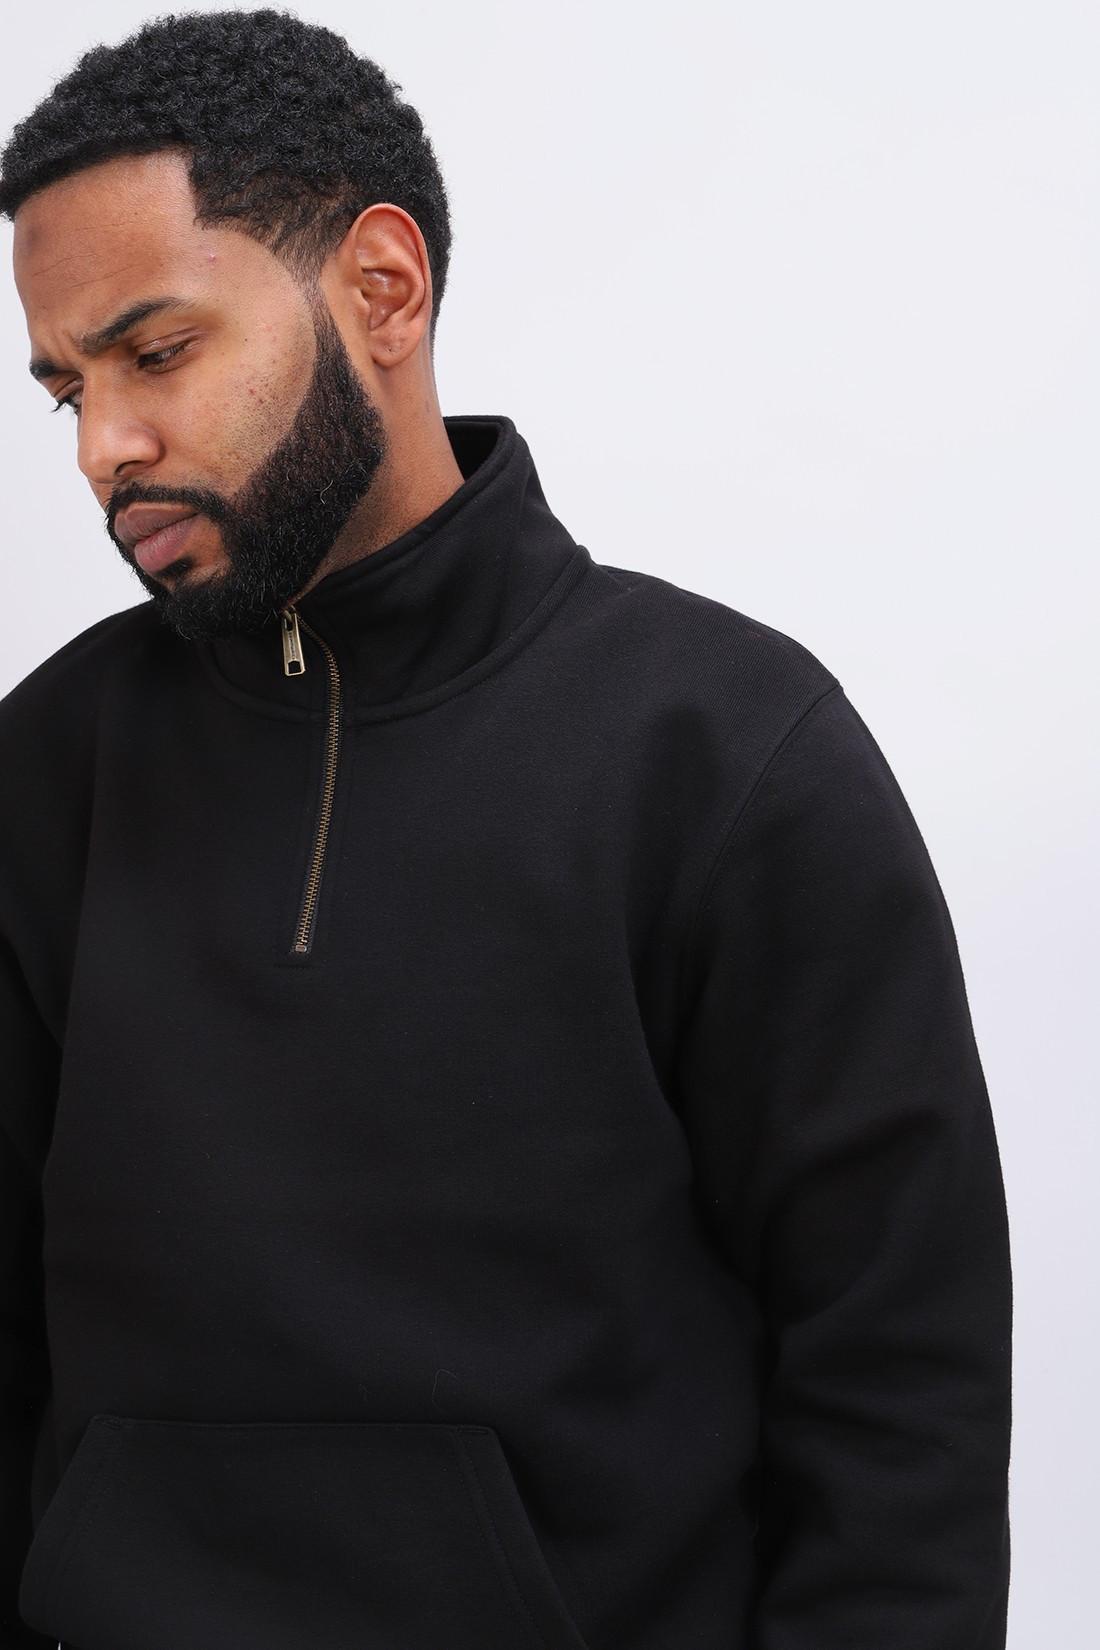 CARHARTT WIP / Chase neck zip sweat Black gold